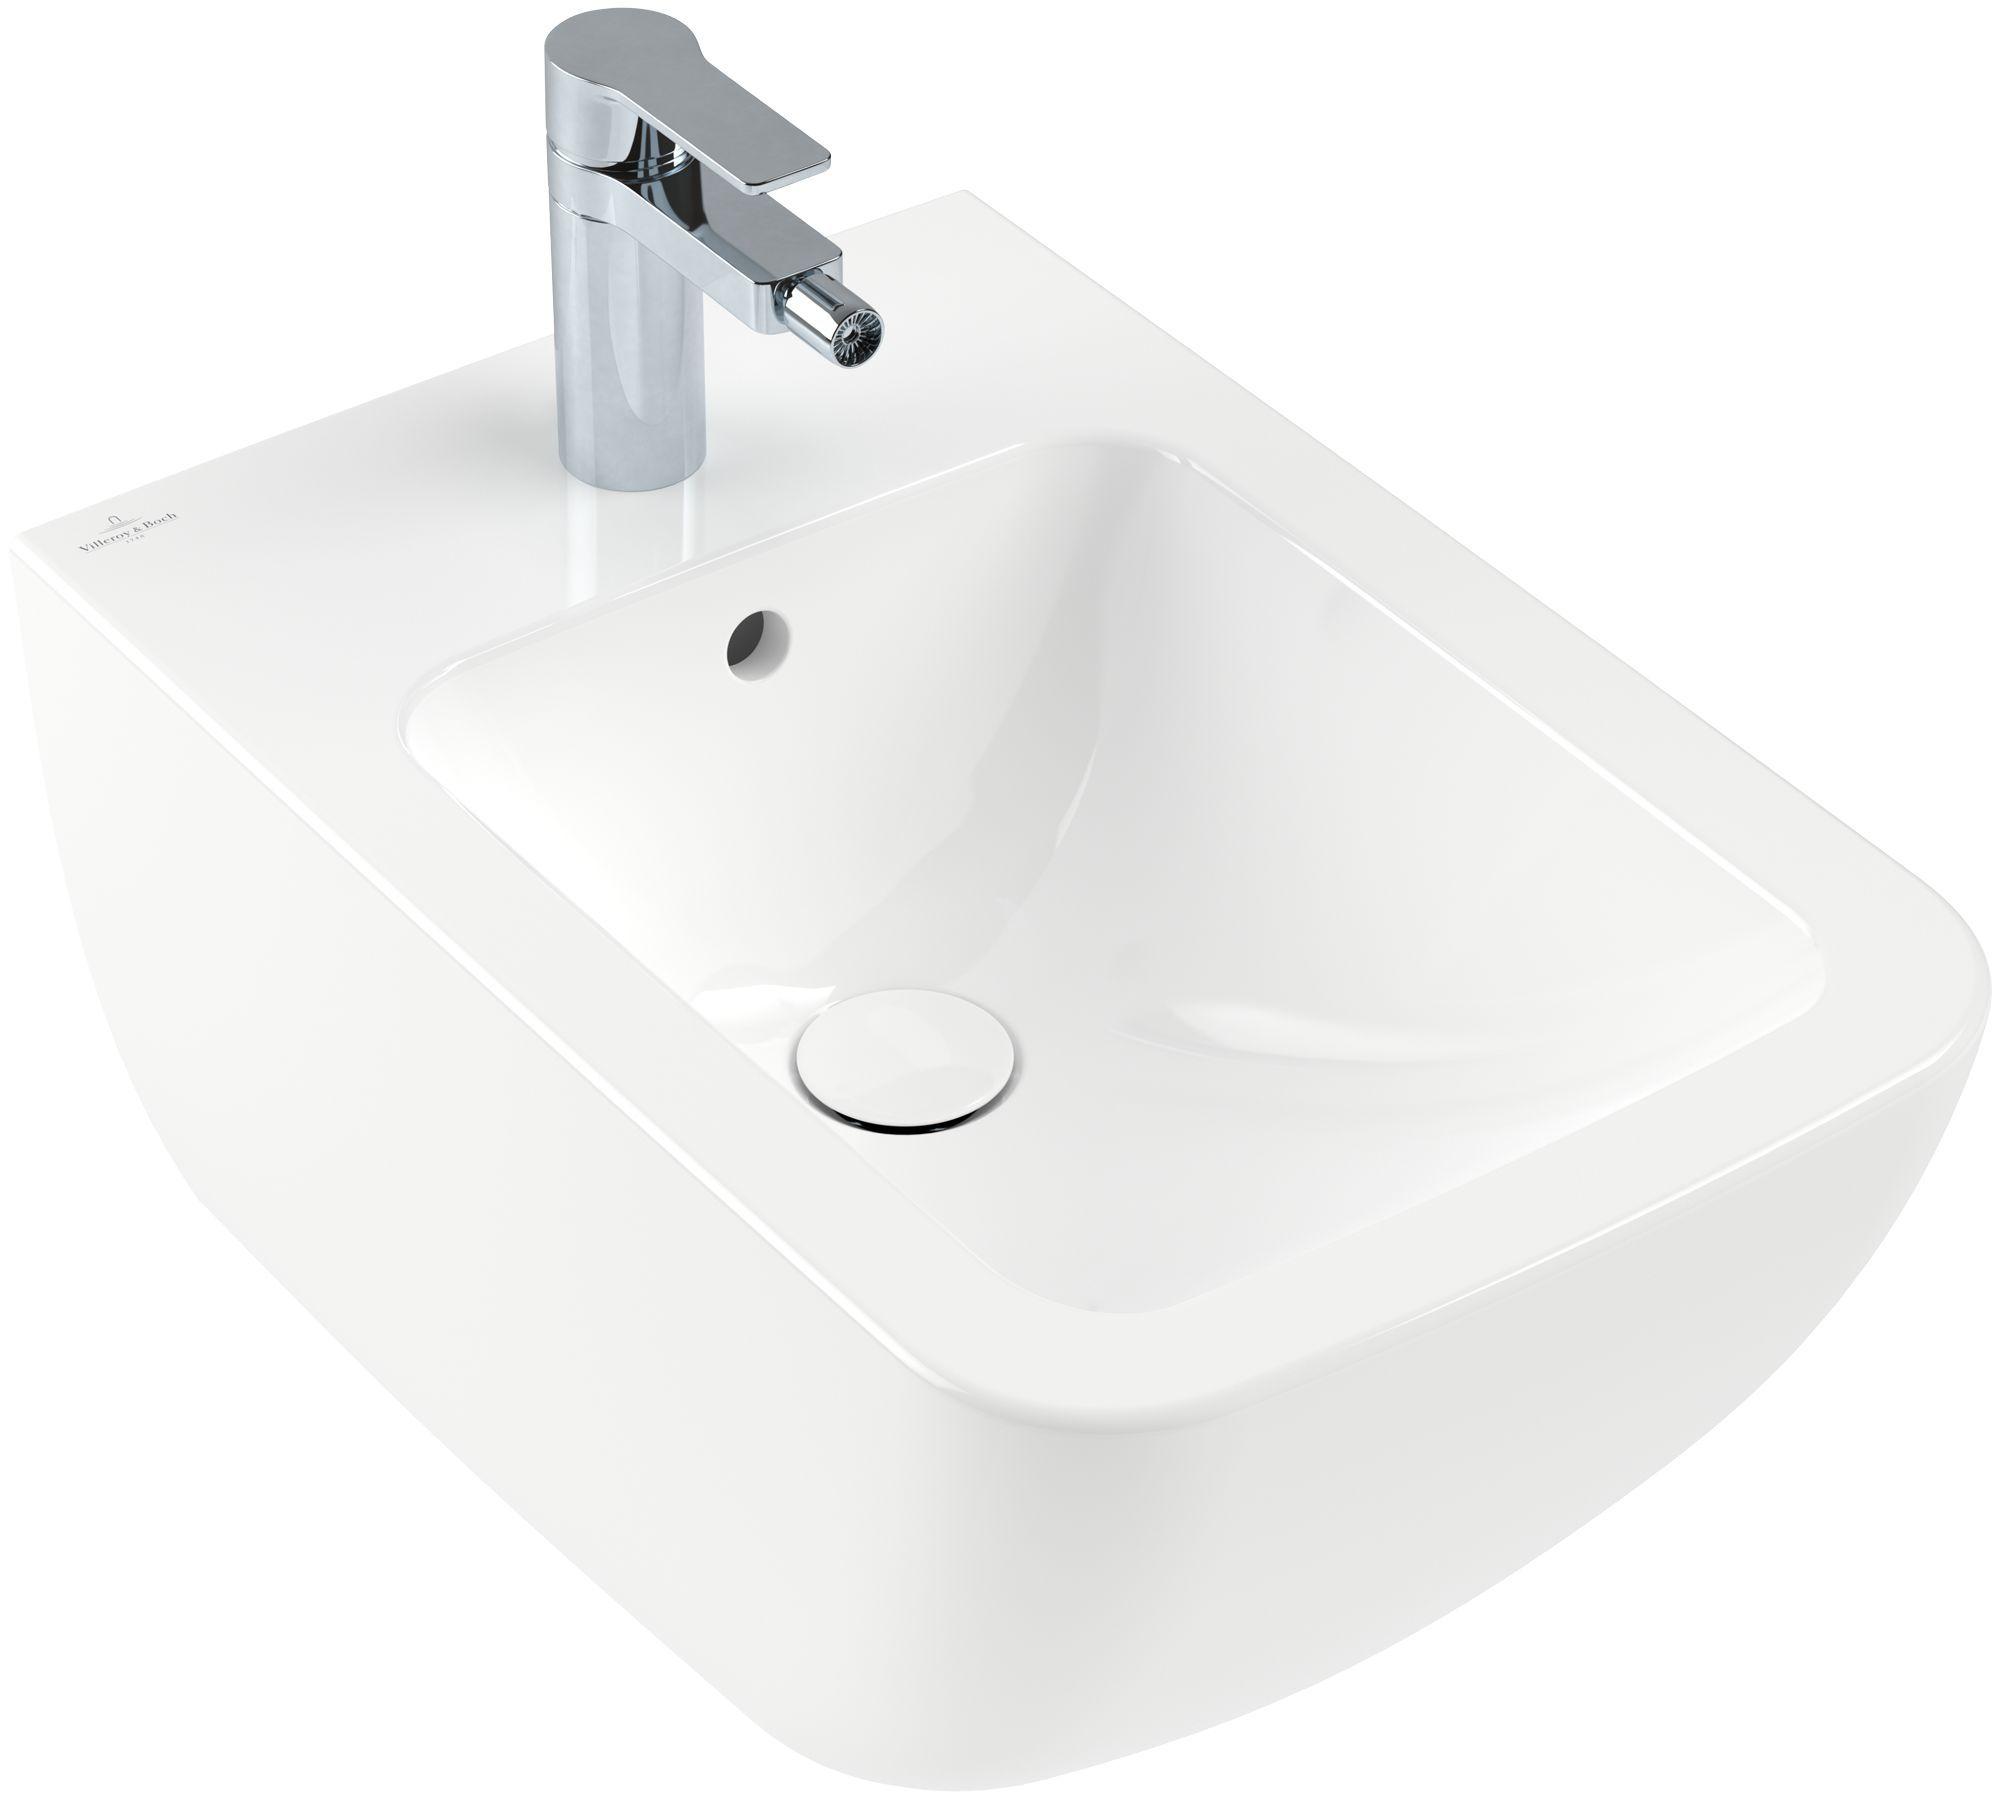 Villeroy & Boch Venticello Bidet B:560 x T:375mm weiß Alpin CeramicPlus 441100R1